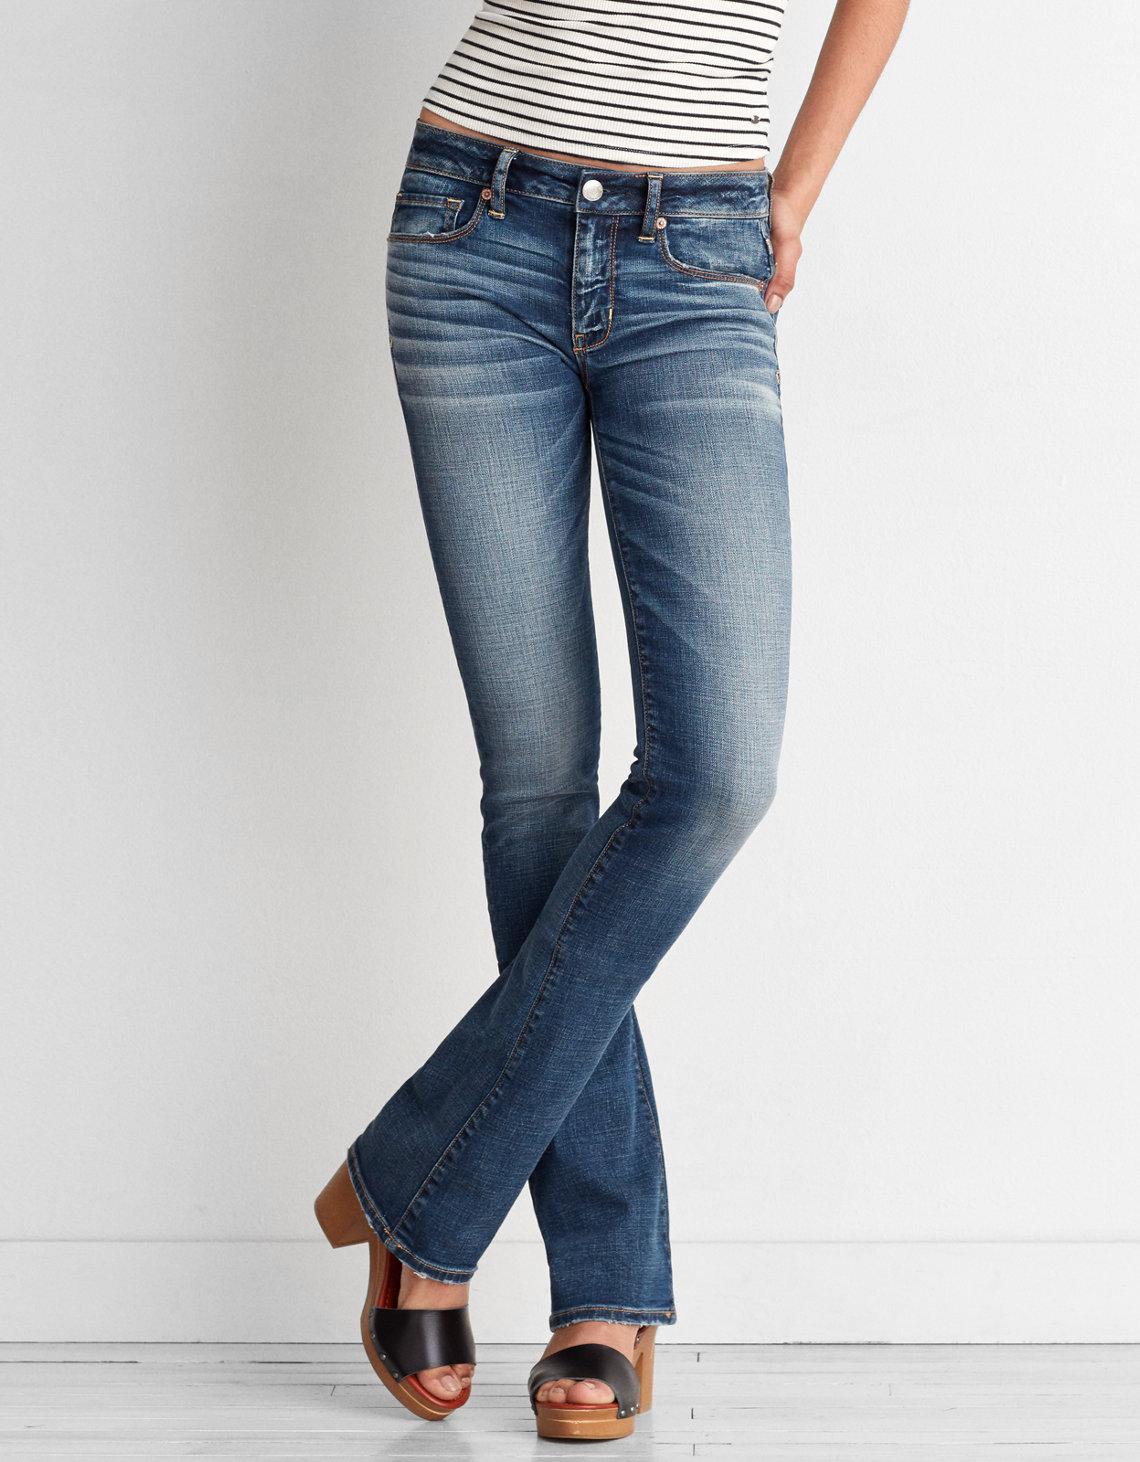 Image result for skinny kick jeans